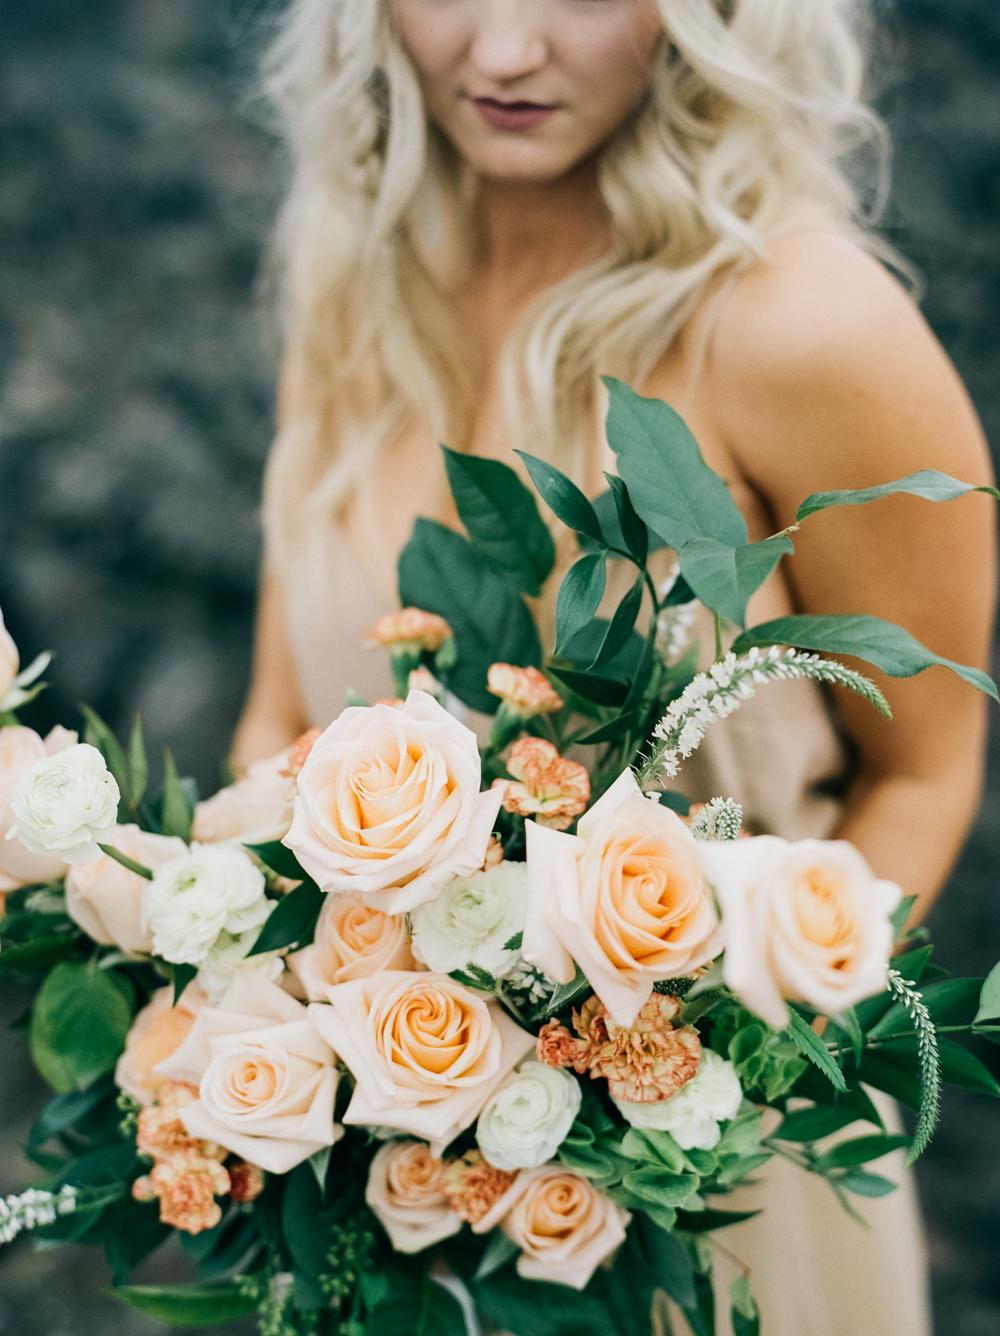 Lava Field Bridal Inspiration | Kendra Elise Photography | Joy Wed blog | http://www.joy-wed.com